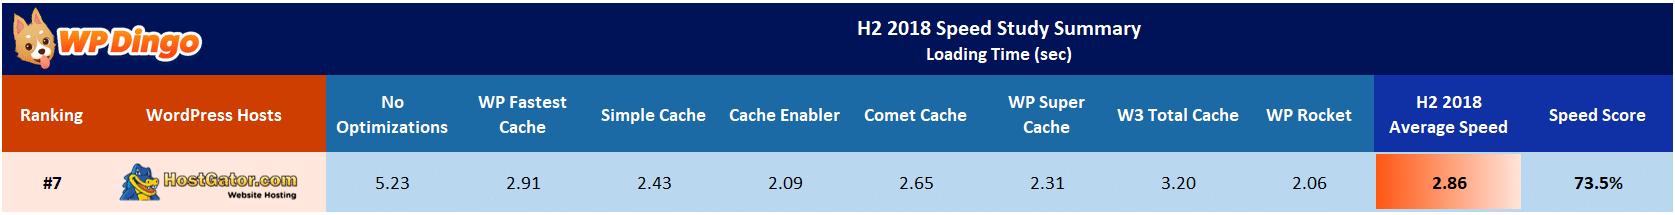 HostGator Speed Test Results Table - Jul 2018 to Dec 2018